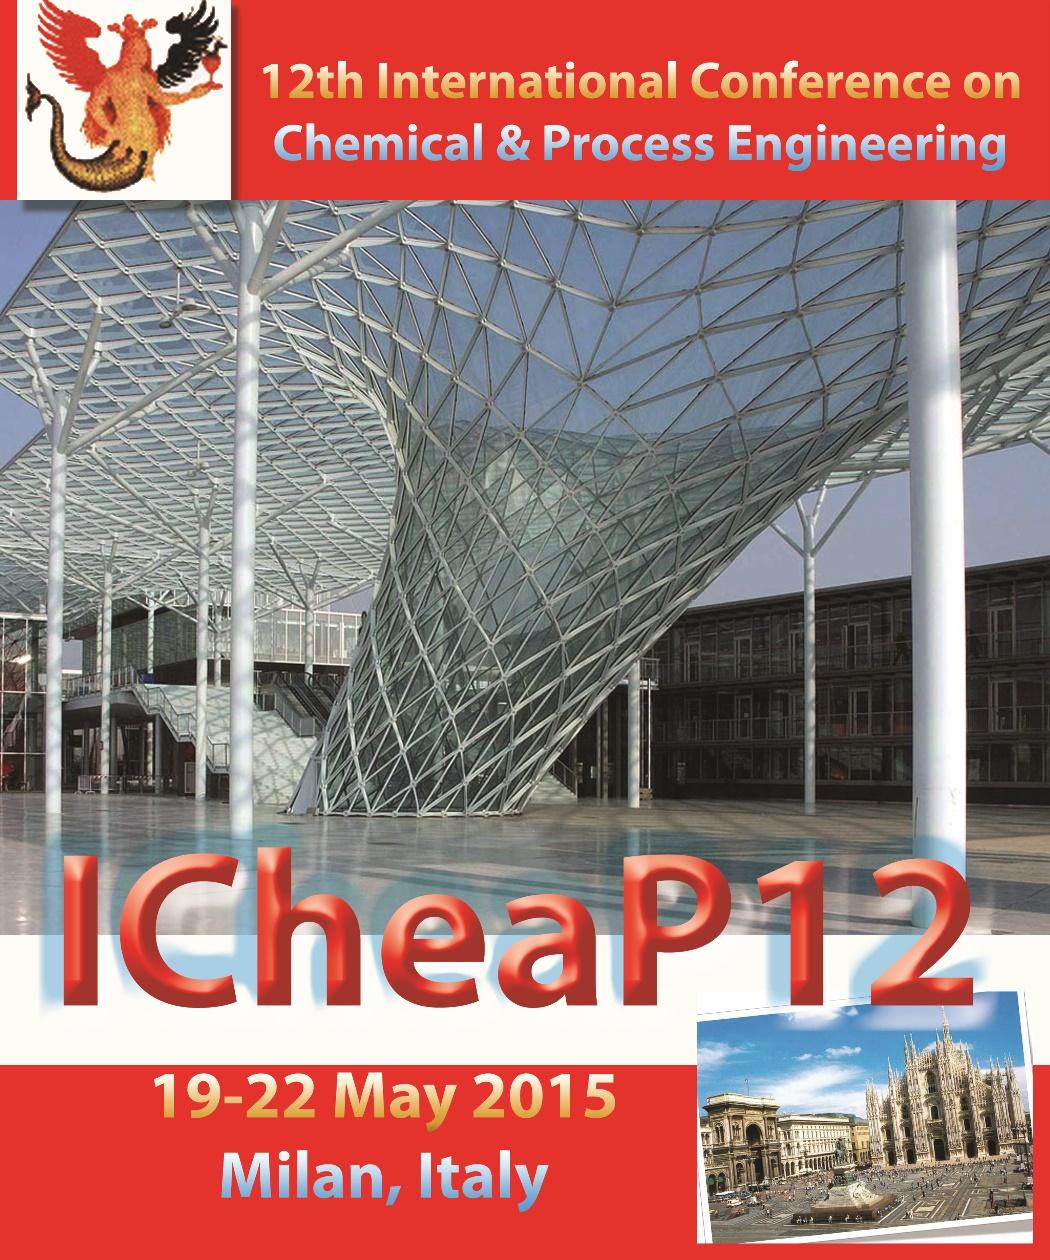 icheap12